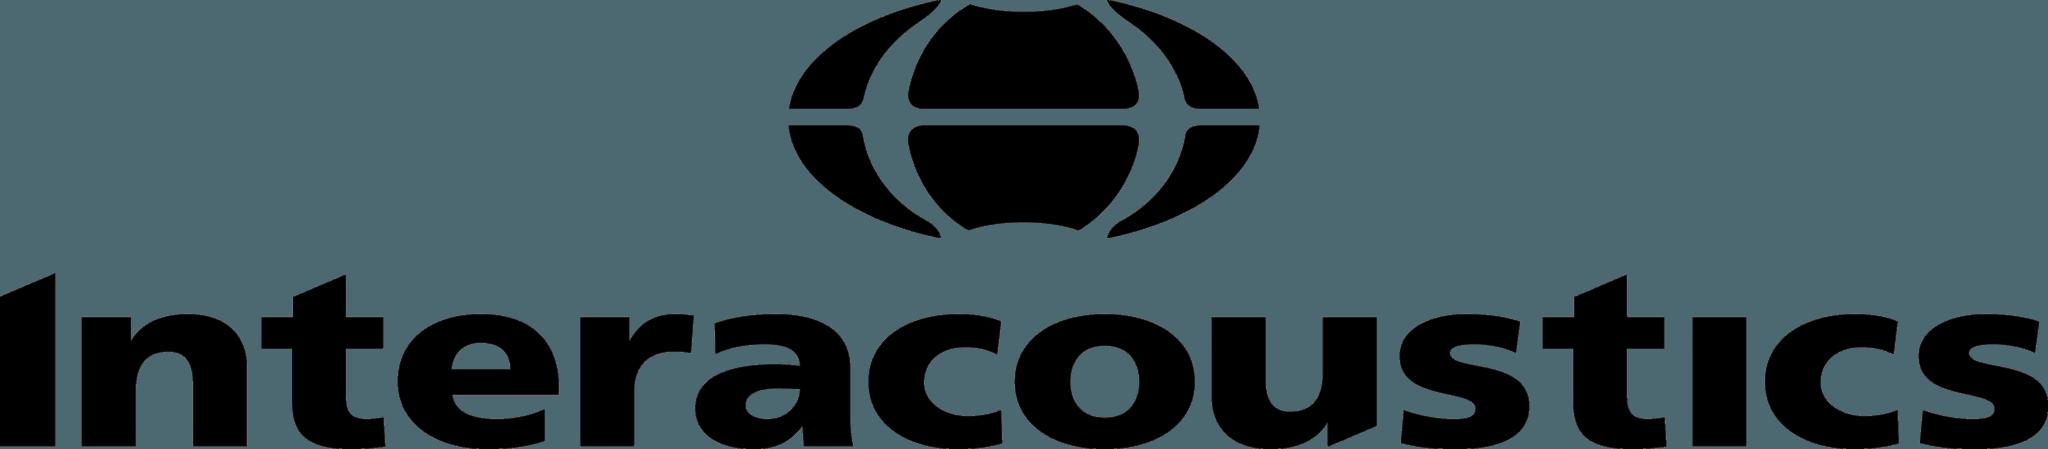 interacoustics logo